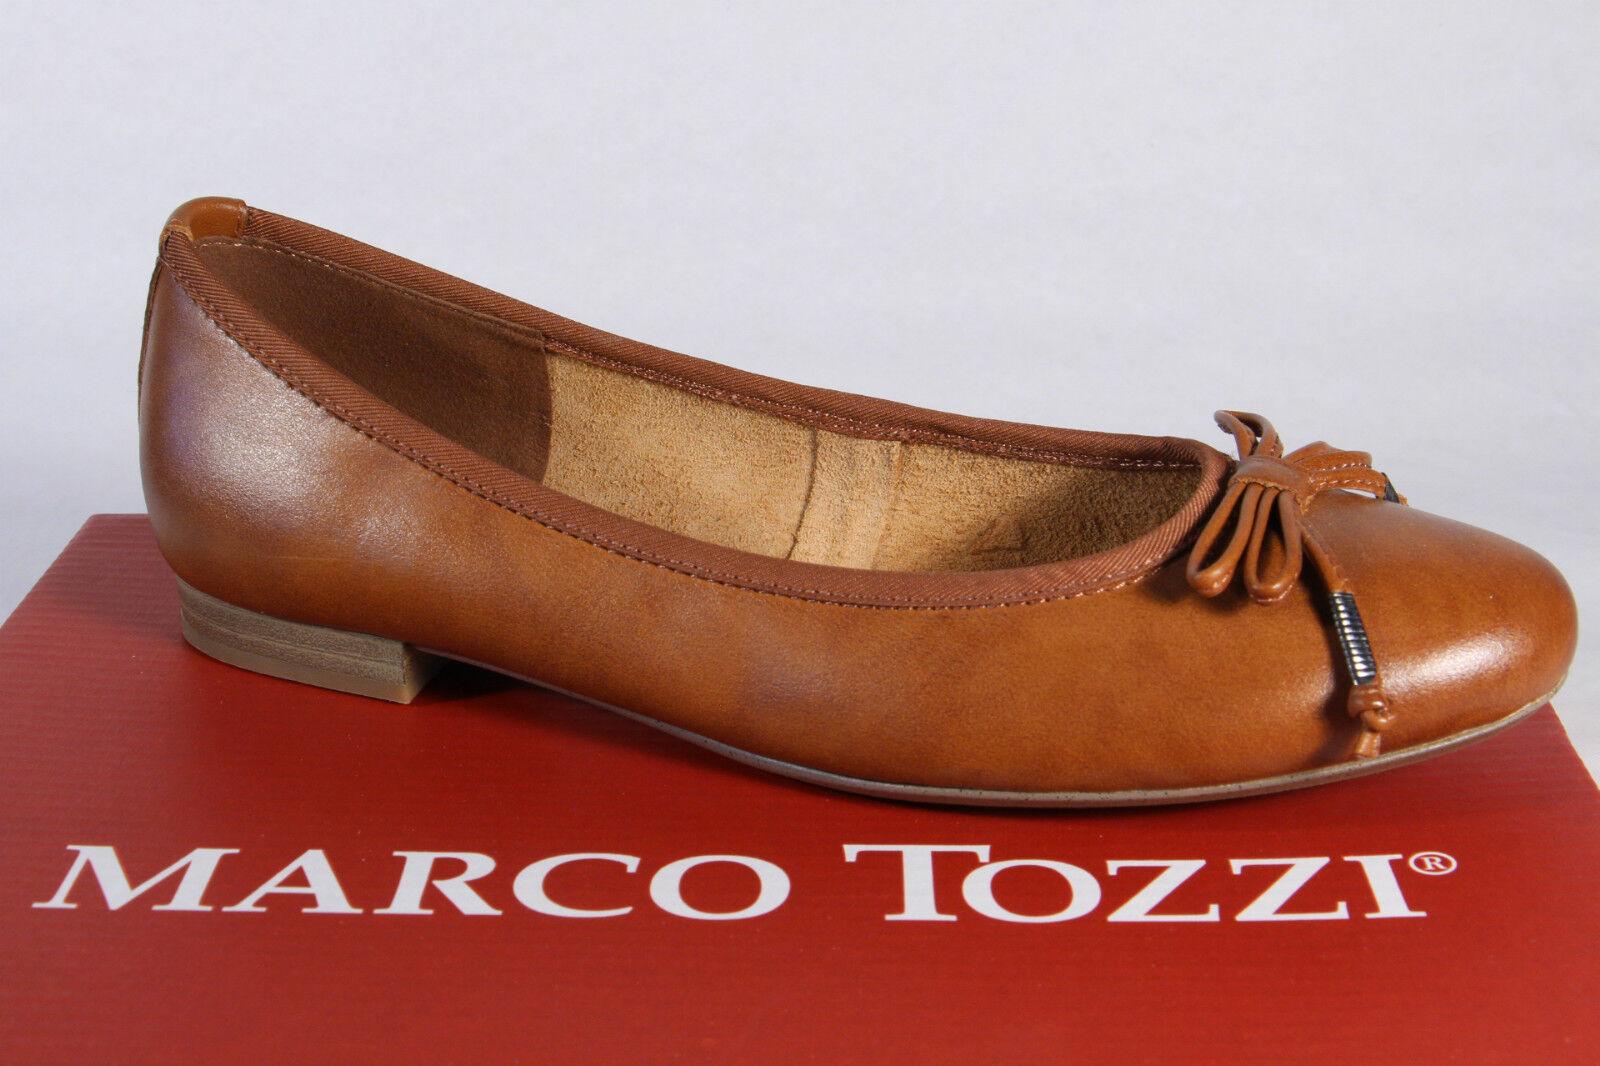 Marco Tozzi Btuttierina Slipper Sautope Basse Zeppe Marronee Nuovo